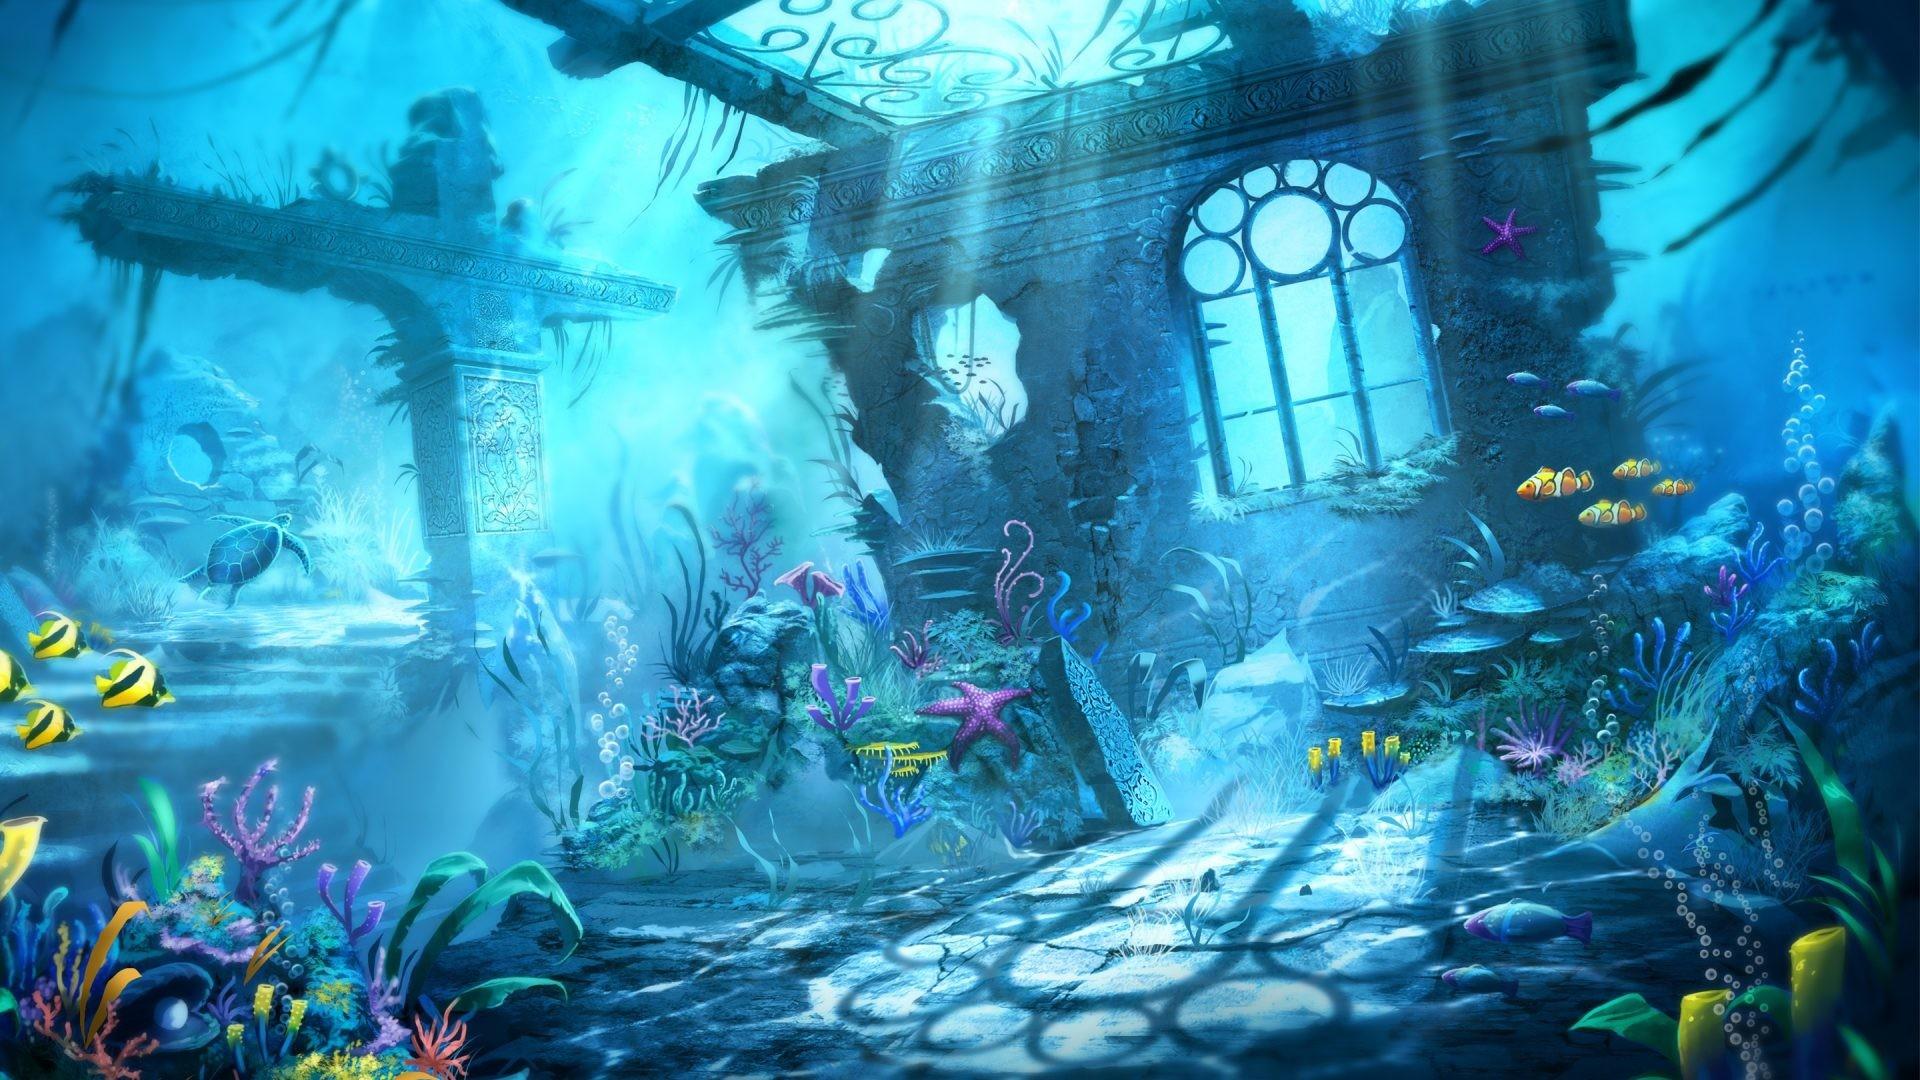 Oceans – Blue Water Mermaid Underwater Scene Sharks Beauty Ocean Desktop  Wallpaper Oceans for HD 16